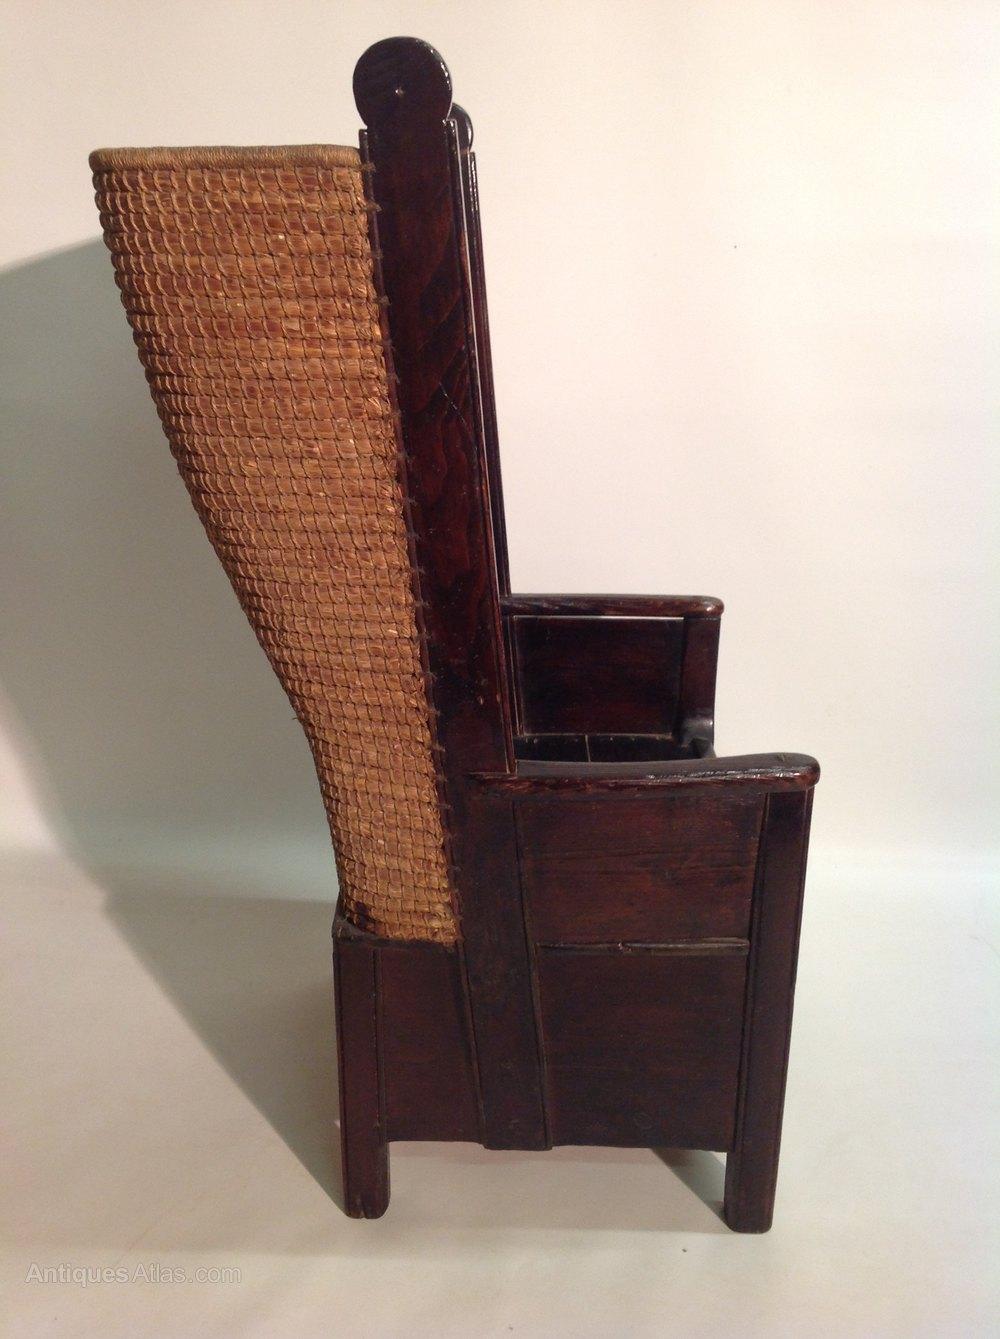 Rare Orkney Chair Antique ... - Rare Orkney Chair - Antiques Atlas - Orkney Chair Antique Antique Furniture